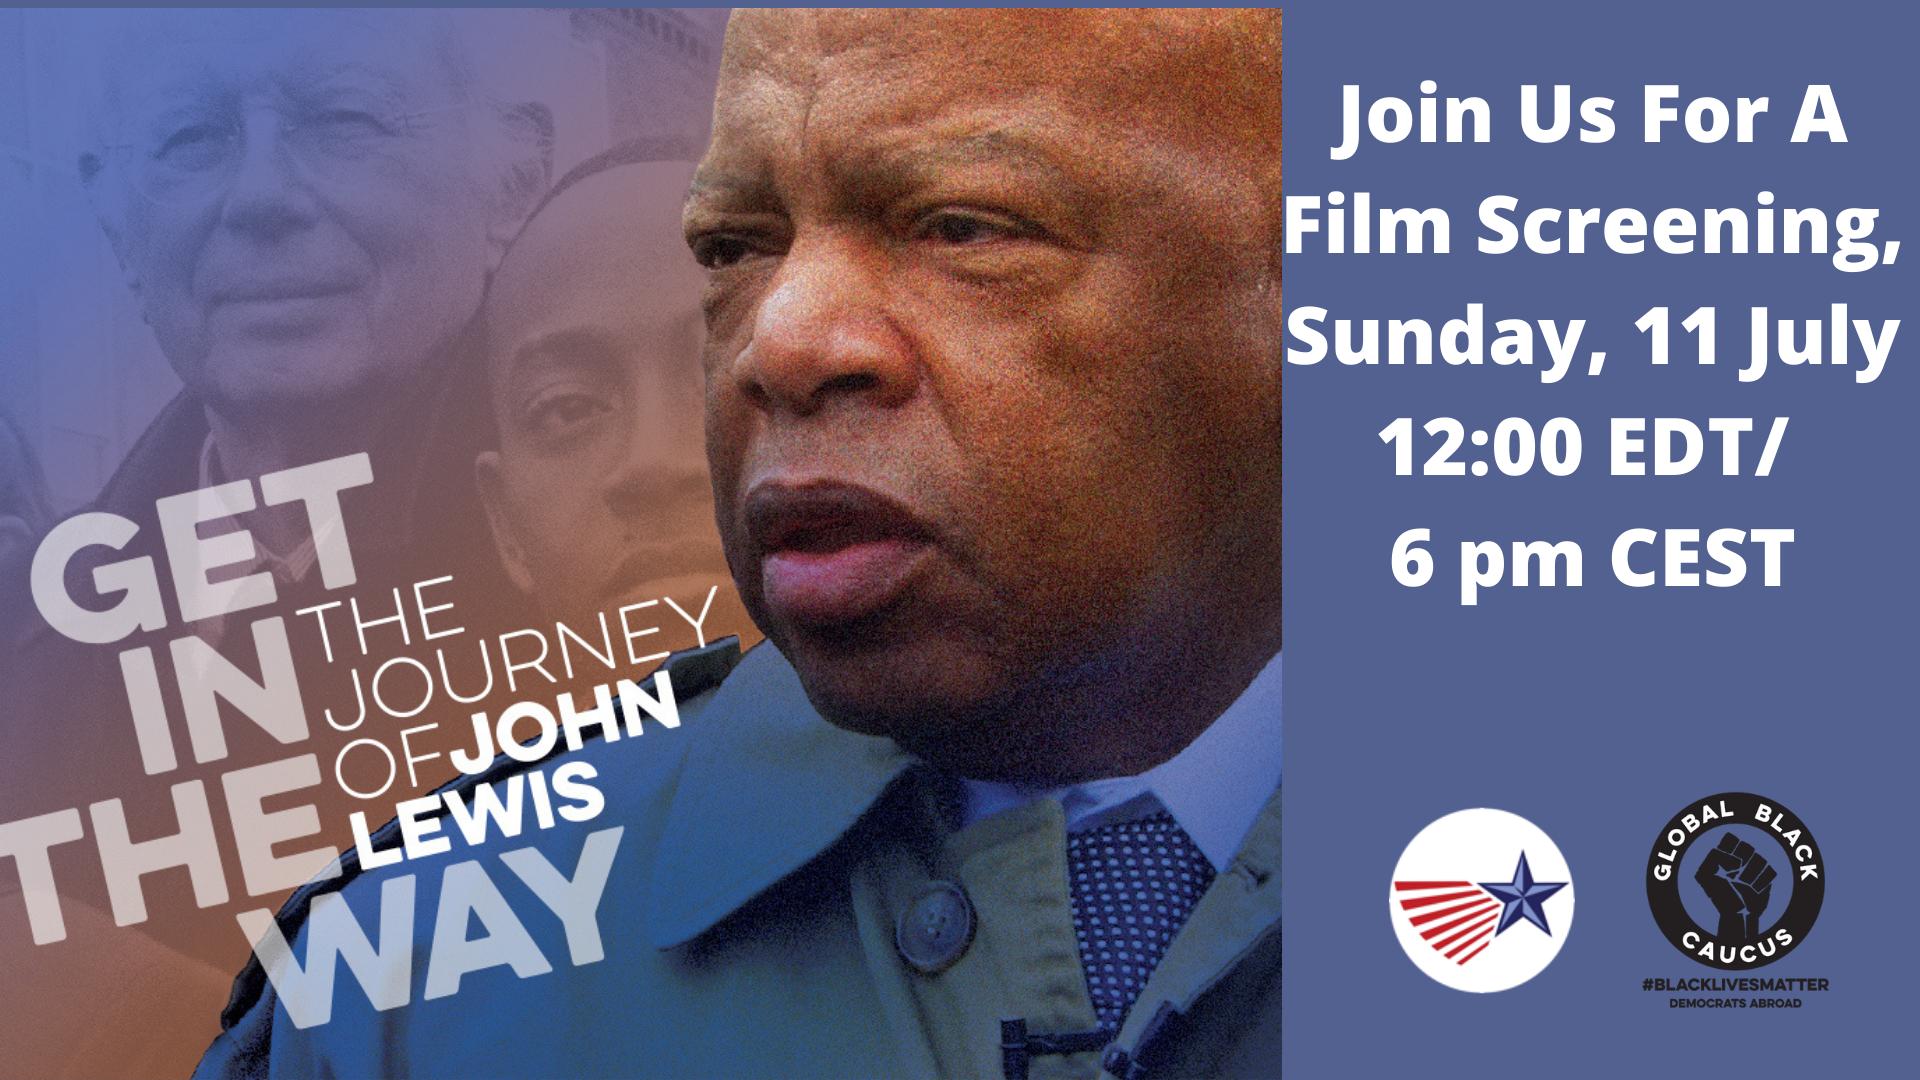 John_lewis_film_screening_2.png